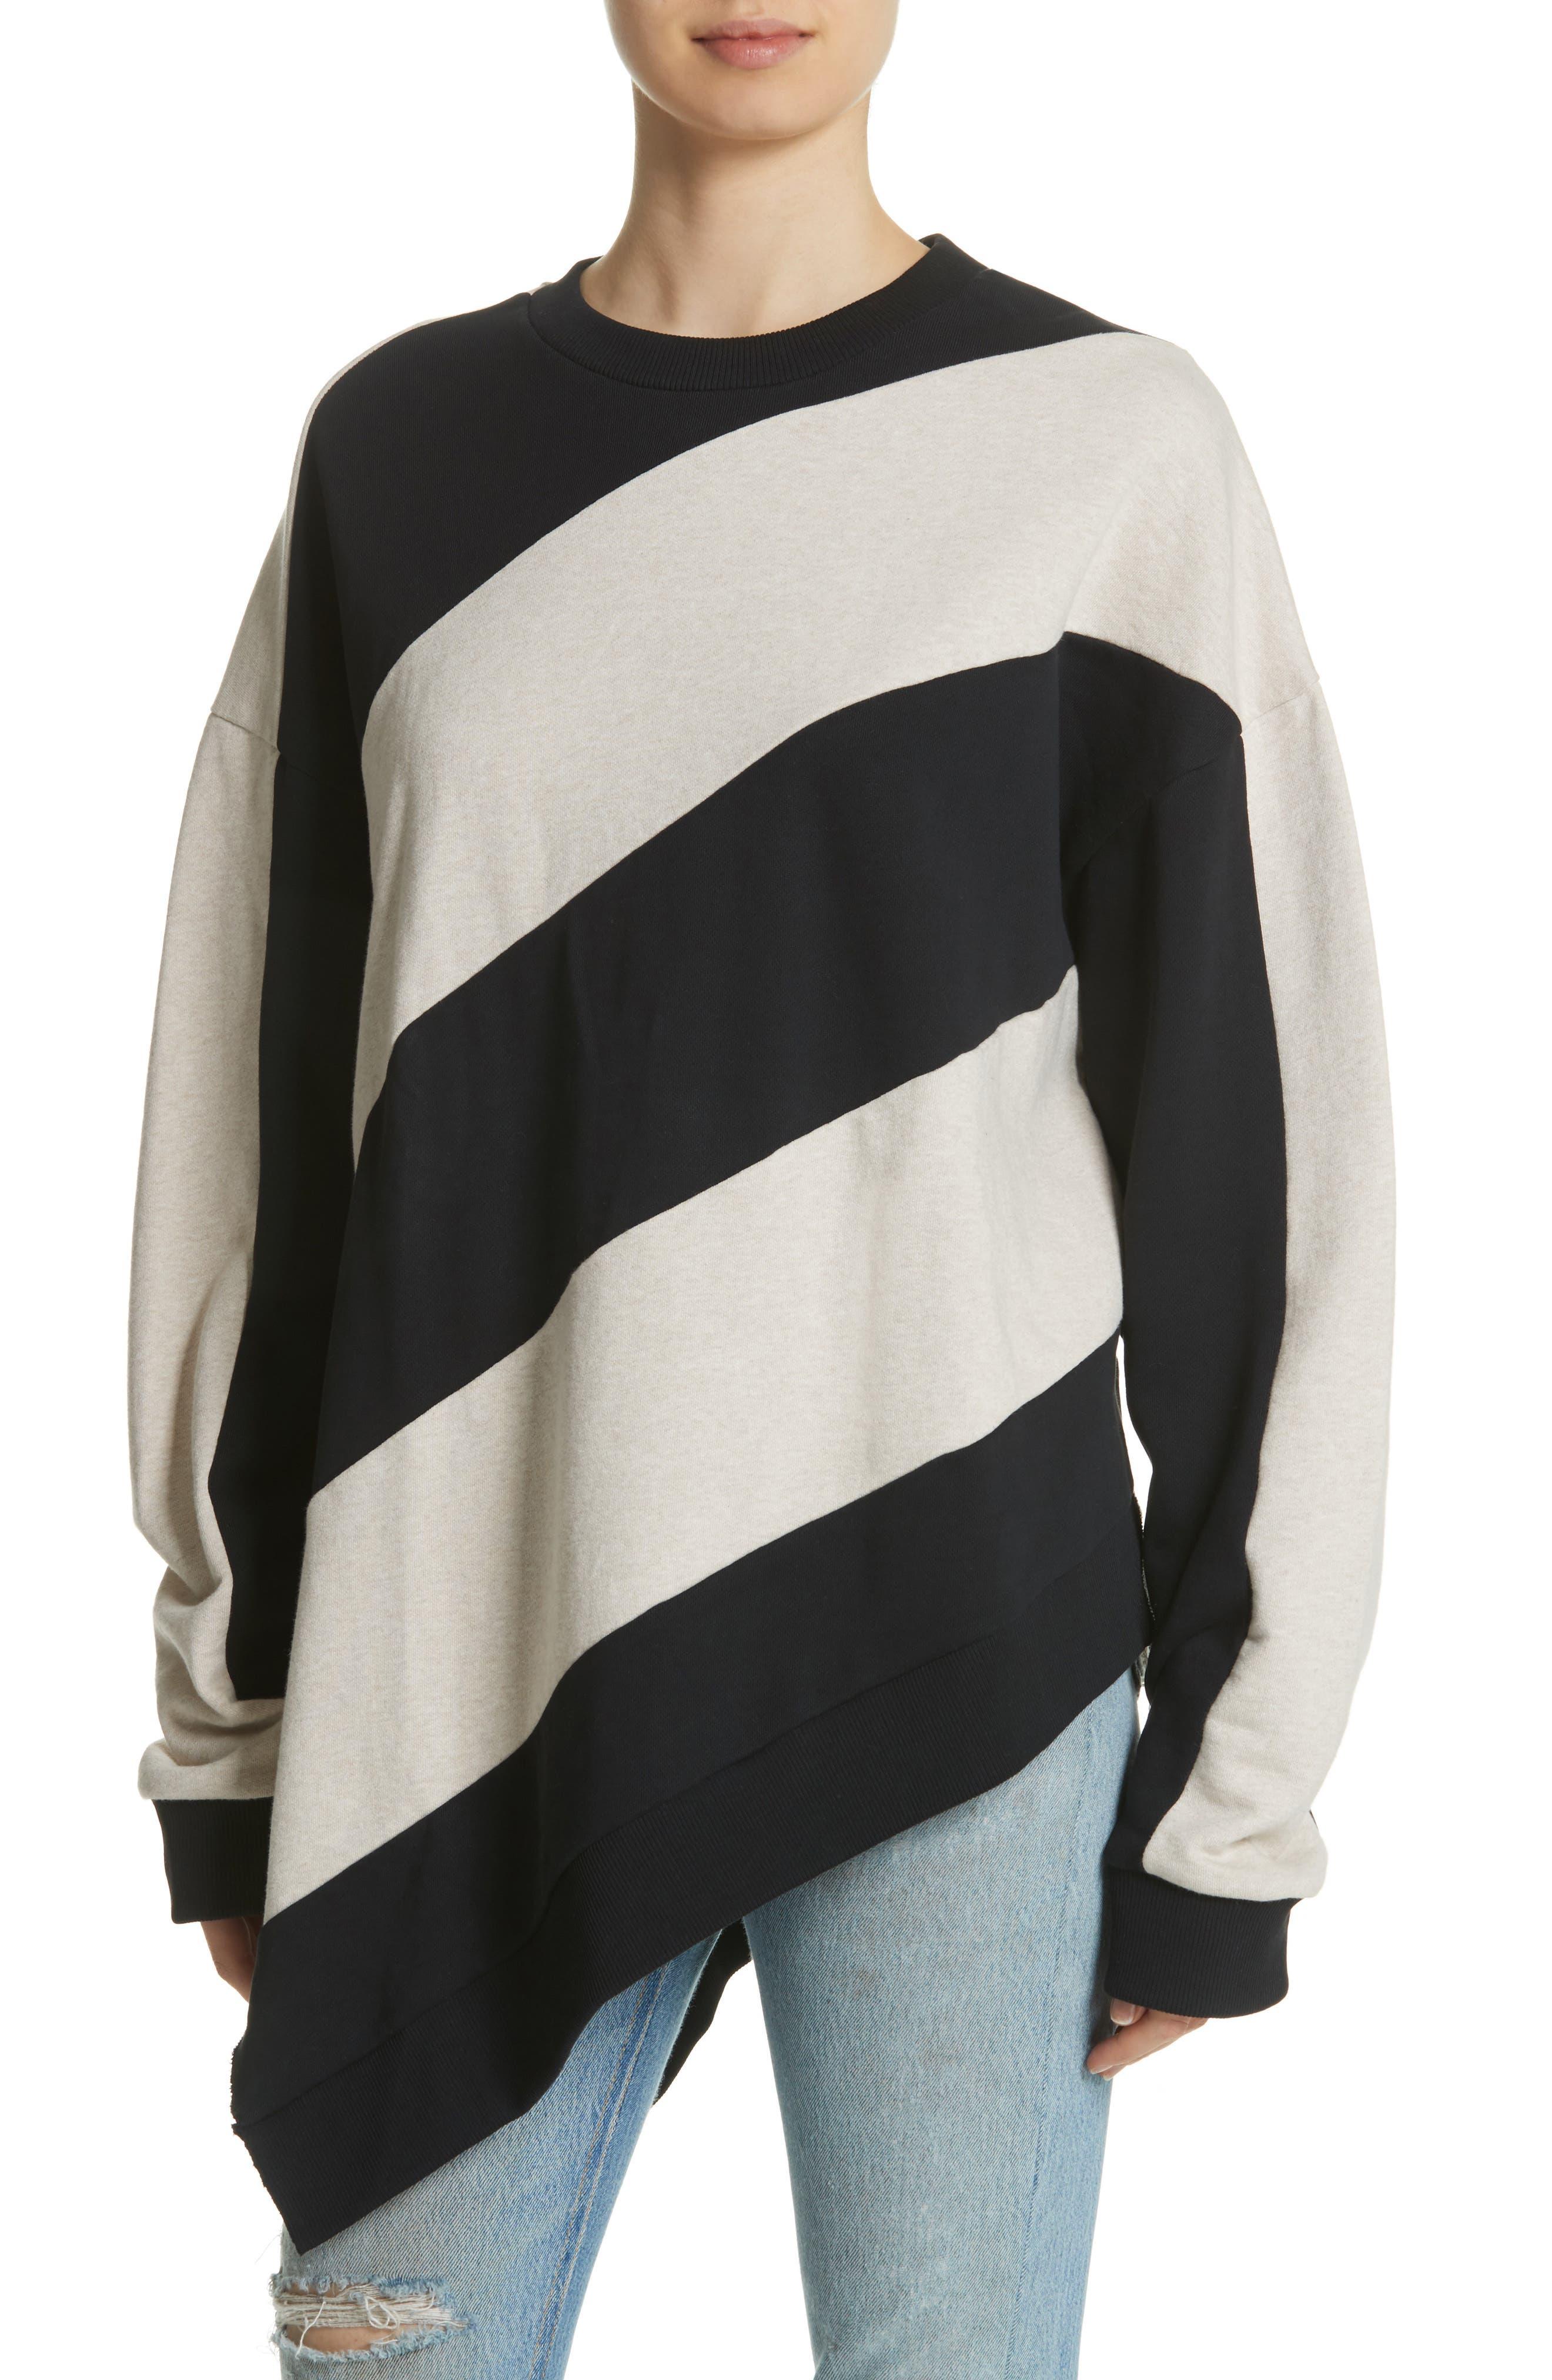 Marques'Almeida Asymmetrical Stripe Sweatshirt,                             Alternate thumbnail 4, color,                             250